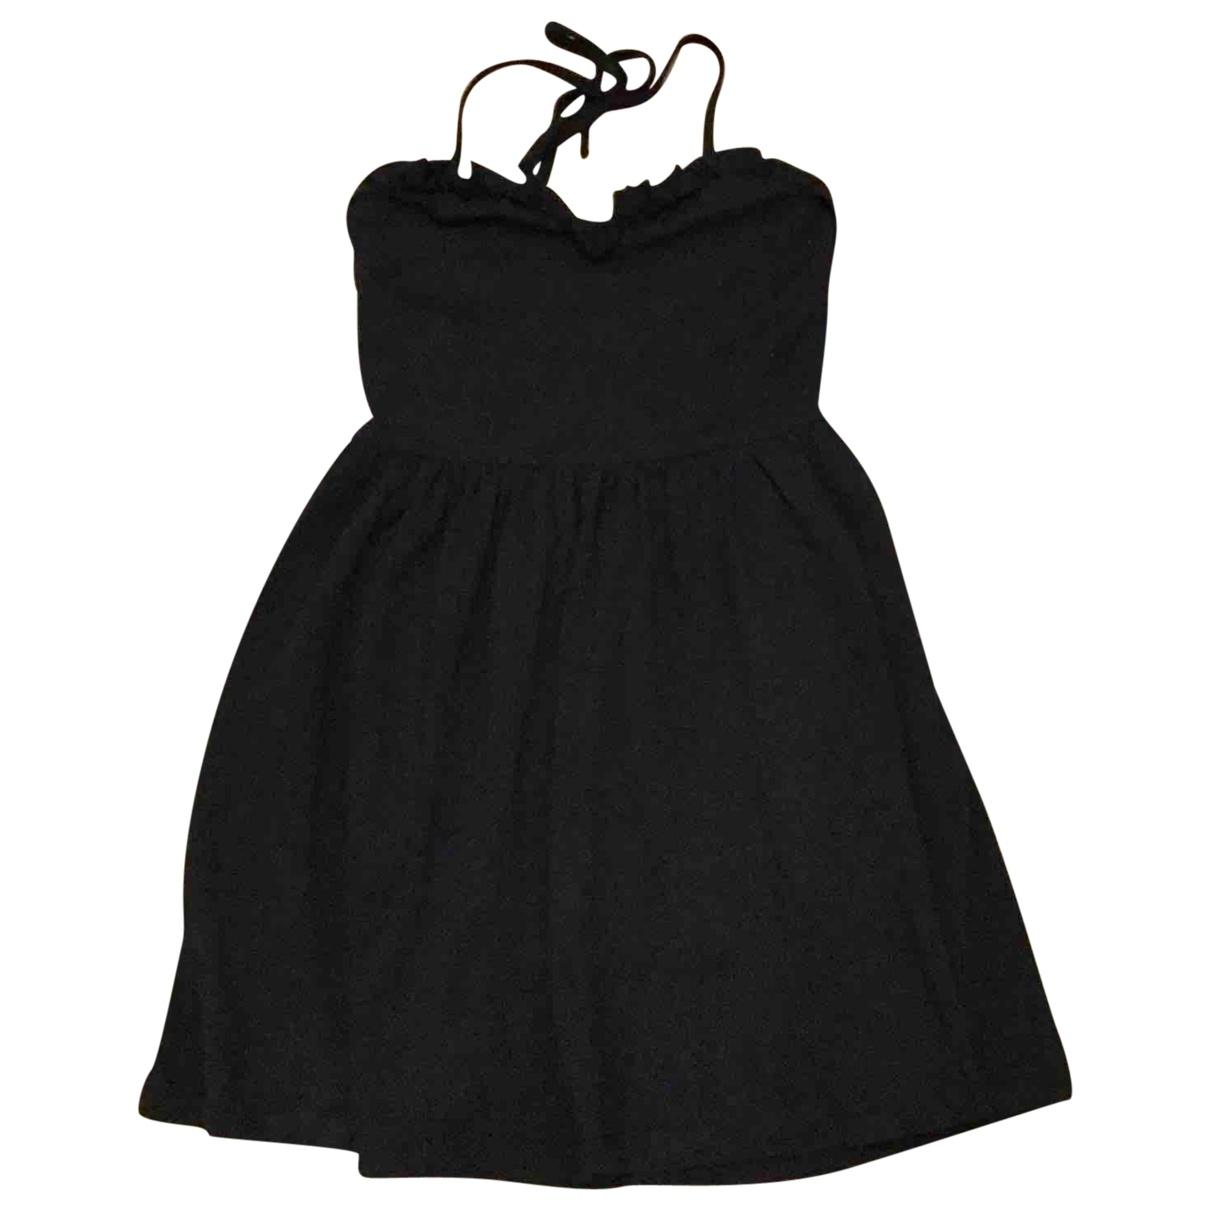 Asos \N Black Cotton - elasthane dress for Women 38 FR